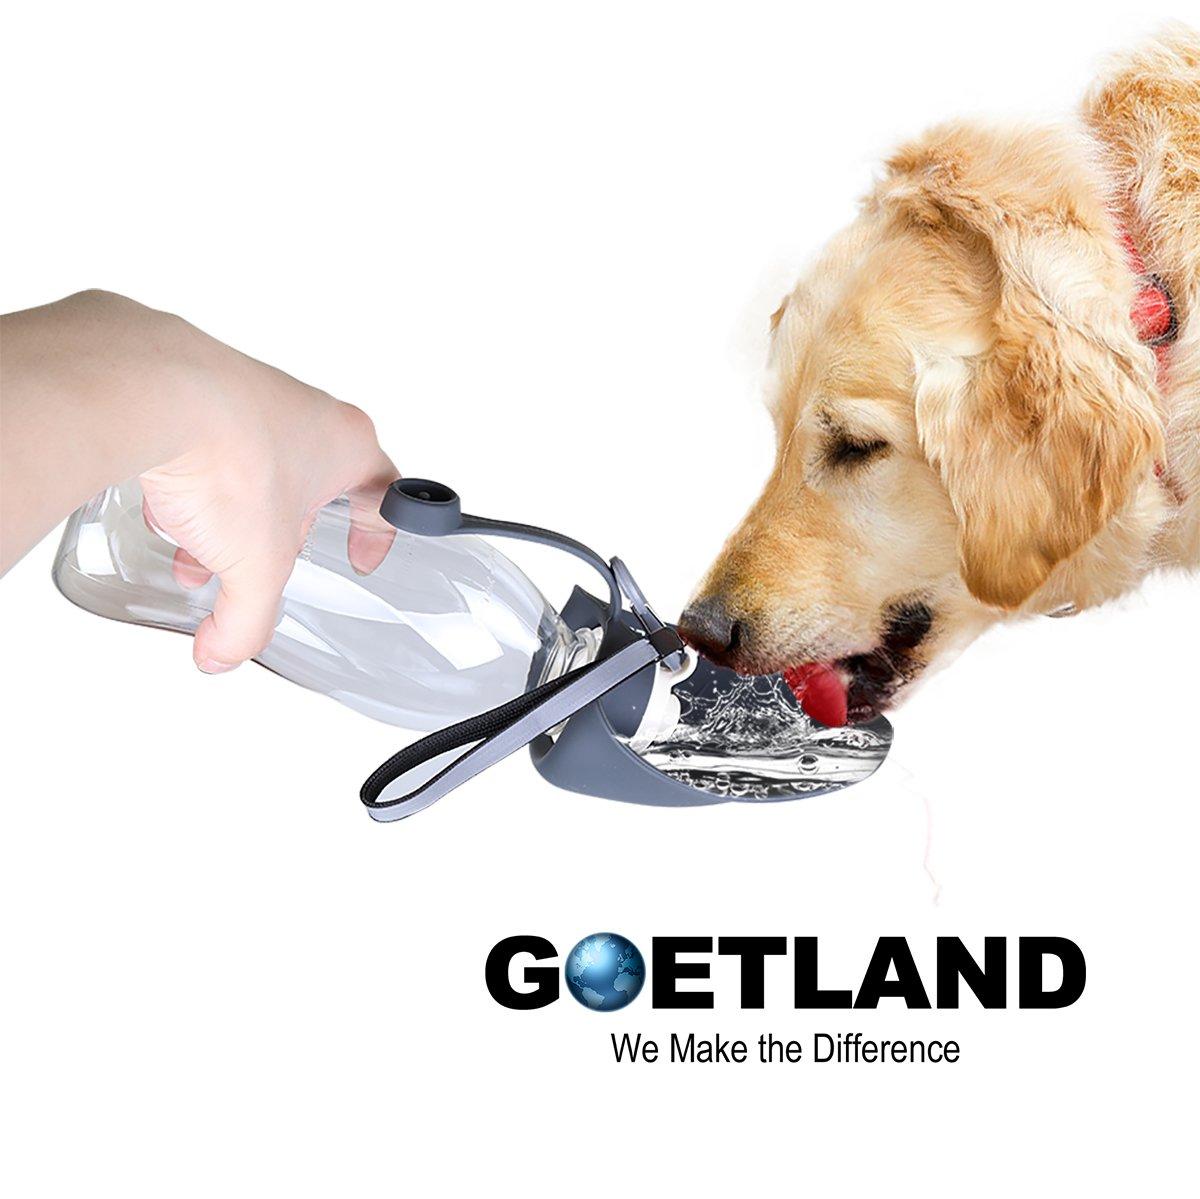 Goetland 20 oz Silicone Portable Dog Water Bottle Travel Bowl Leak Proof BPA Free with Free Strap, Grey